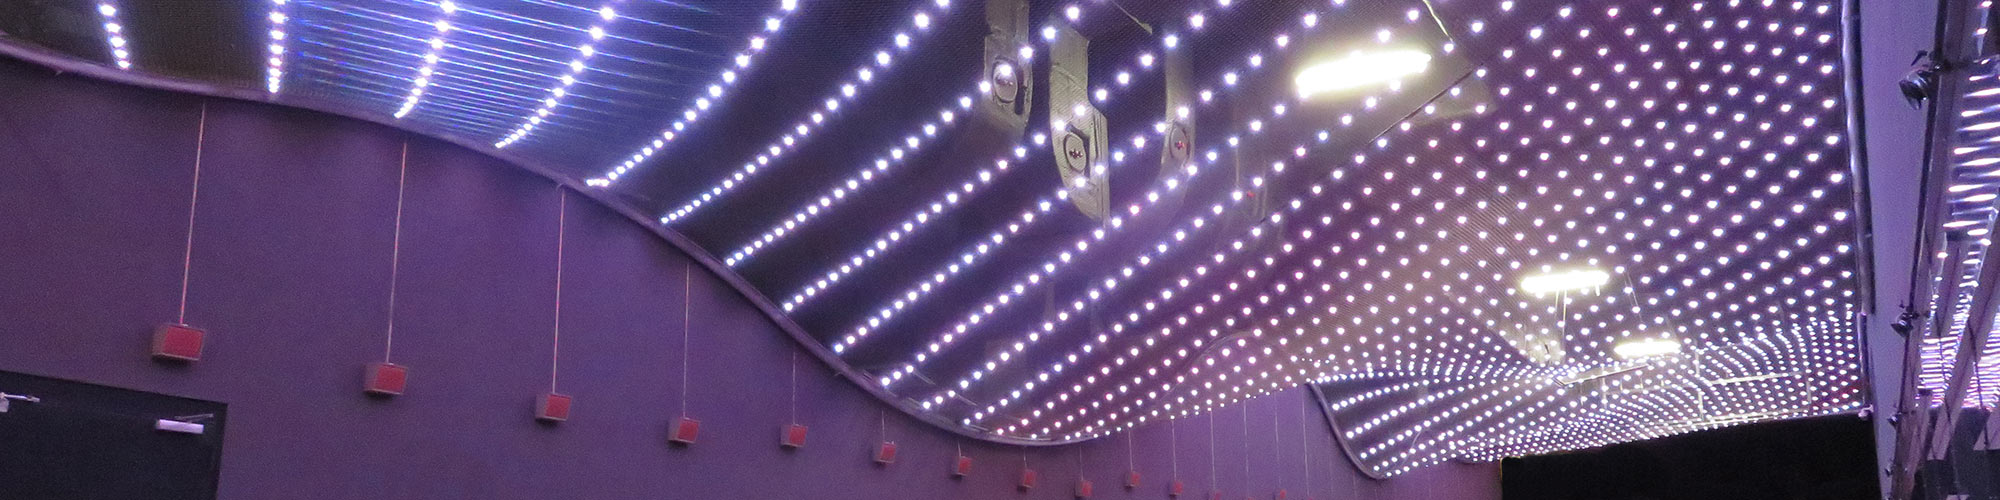 LED Lichtdecken X-LED LED Lichtmodulsystem Netz